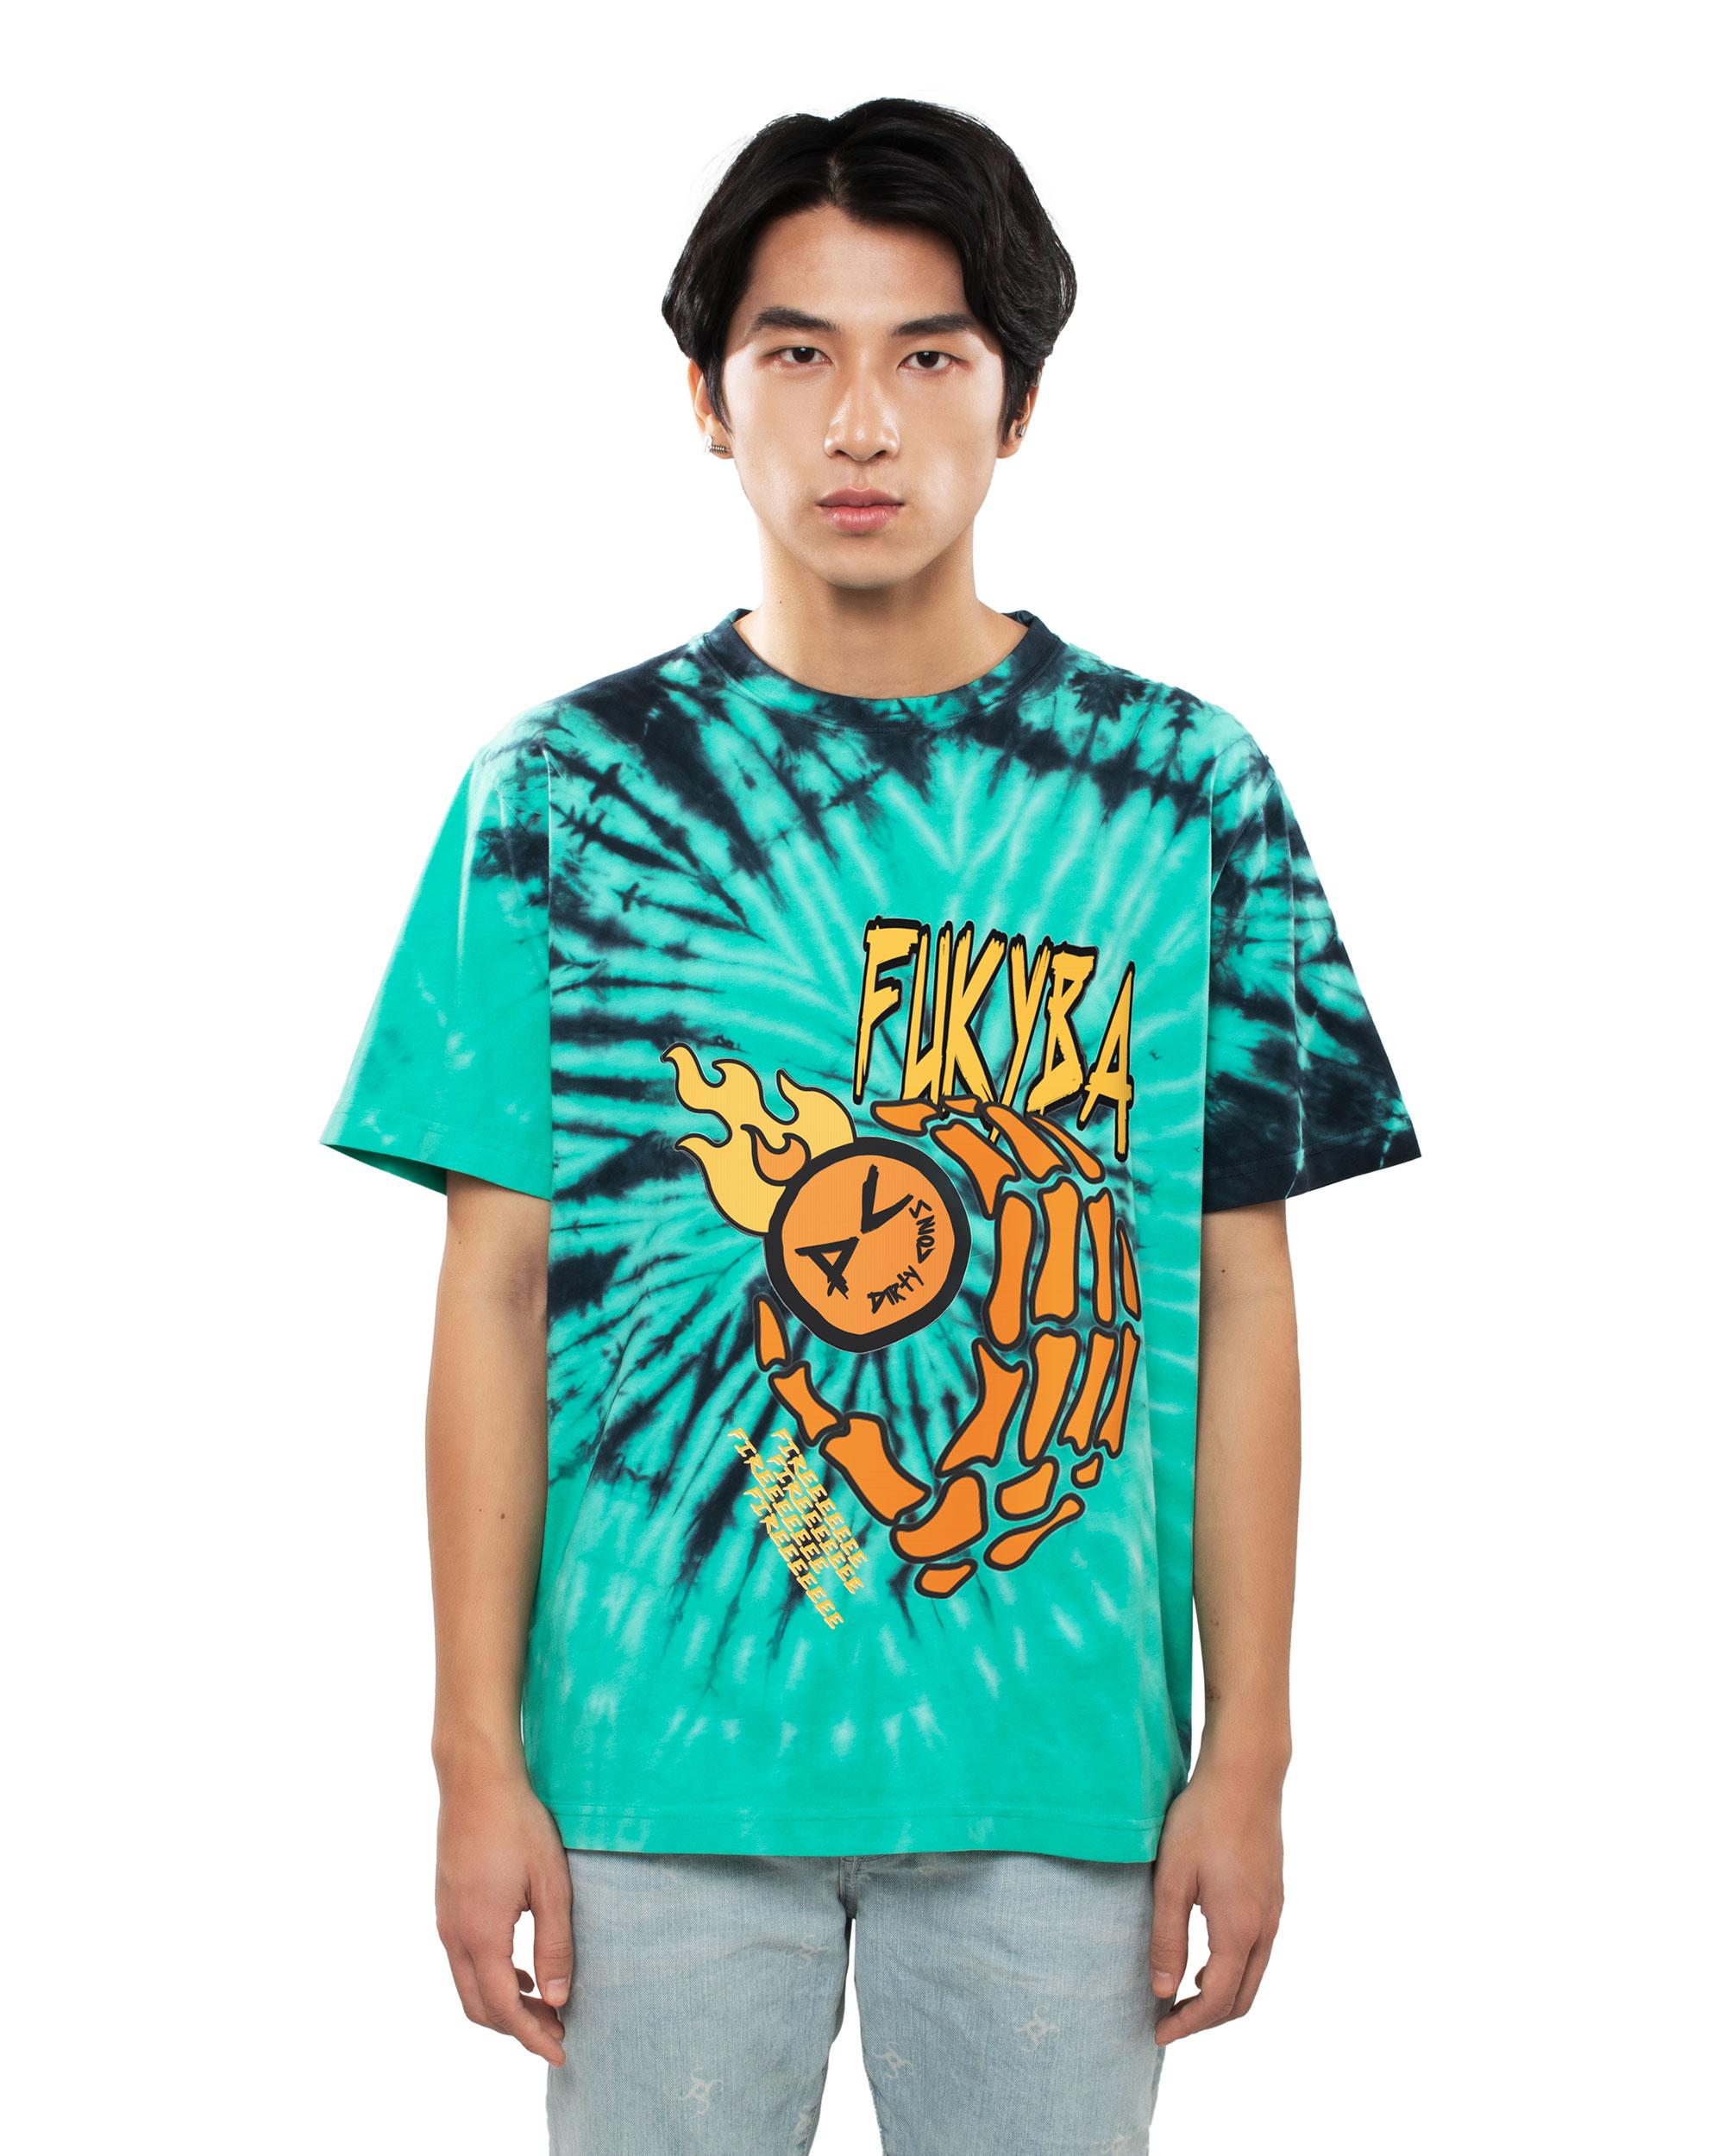 DirtyCoins Fukyba Tiedye T-Shirt - Green